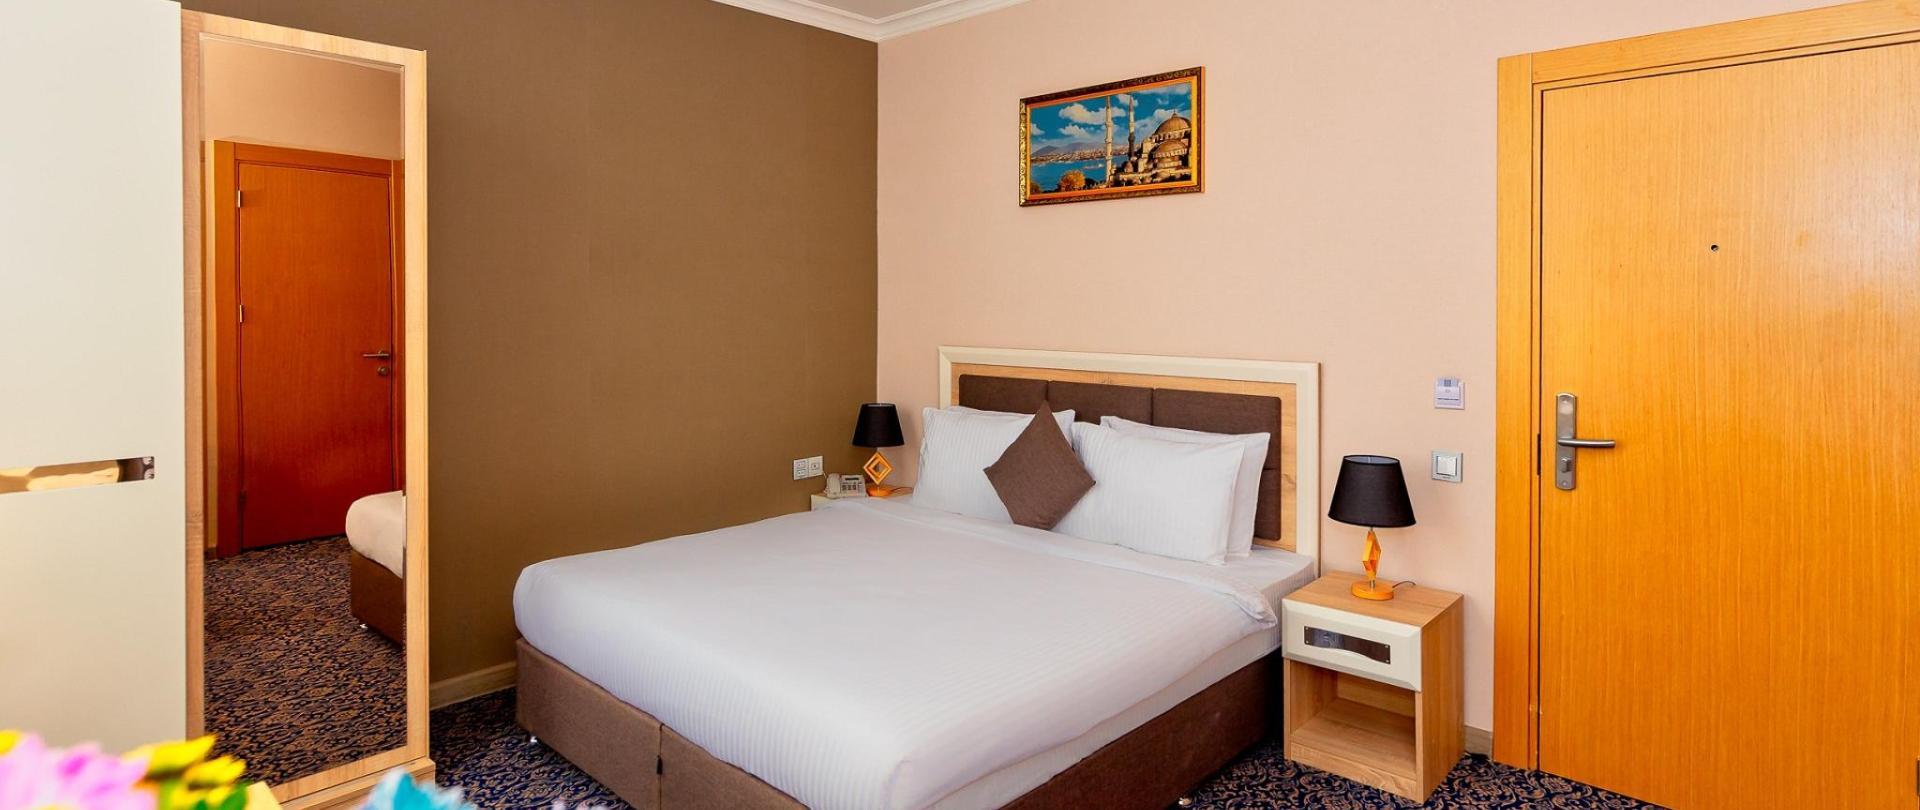 Metrocity Hotel-17.jpg